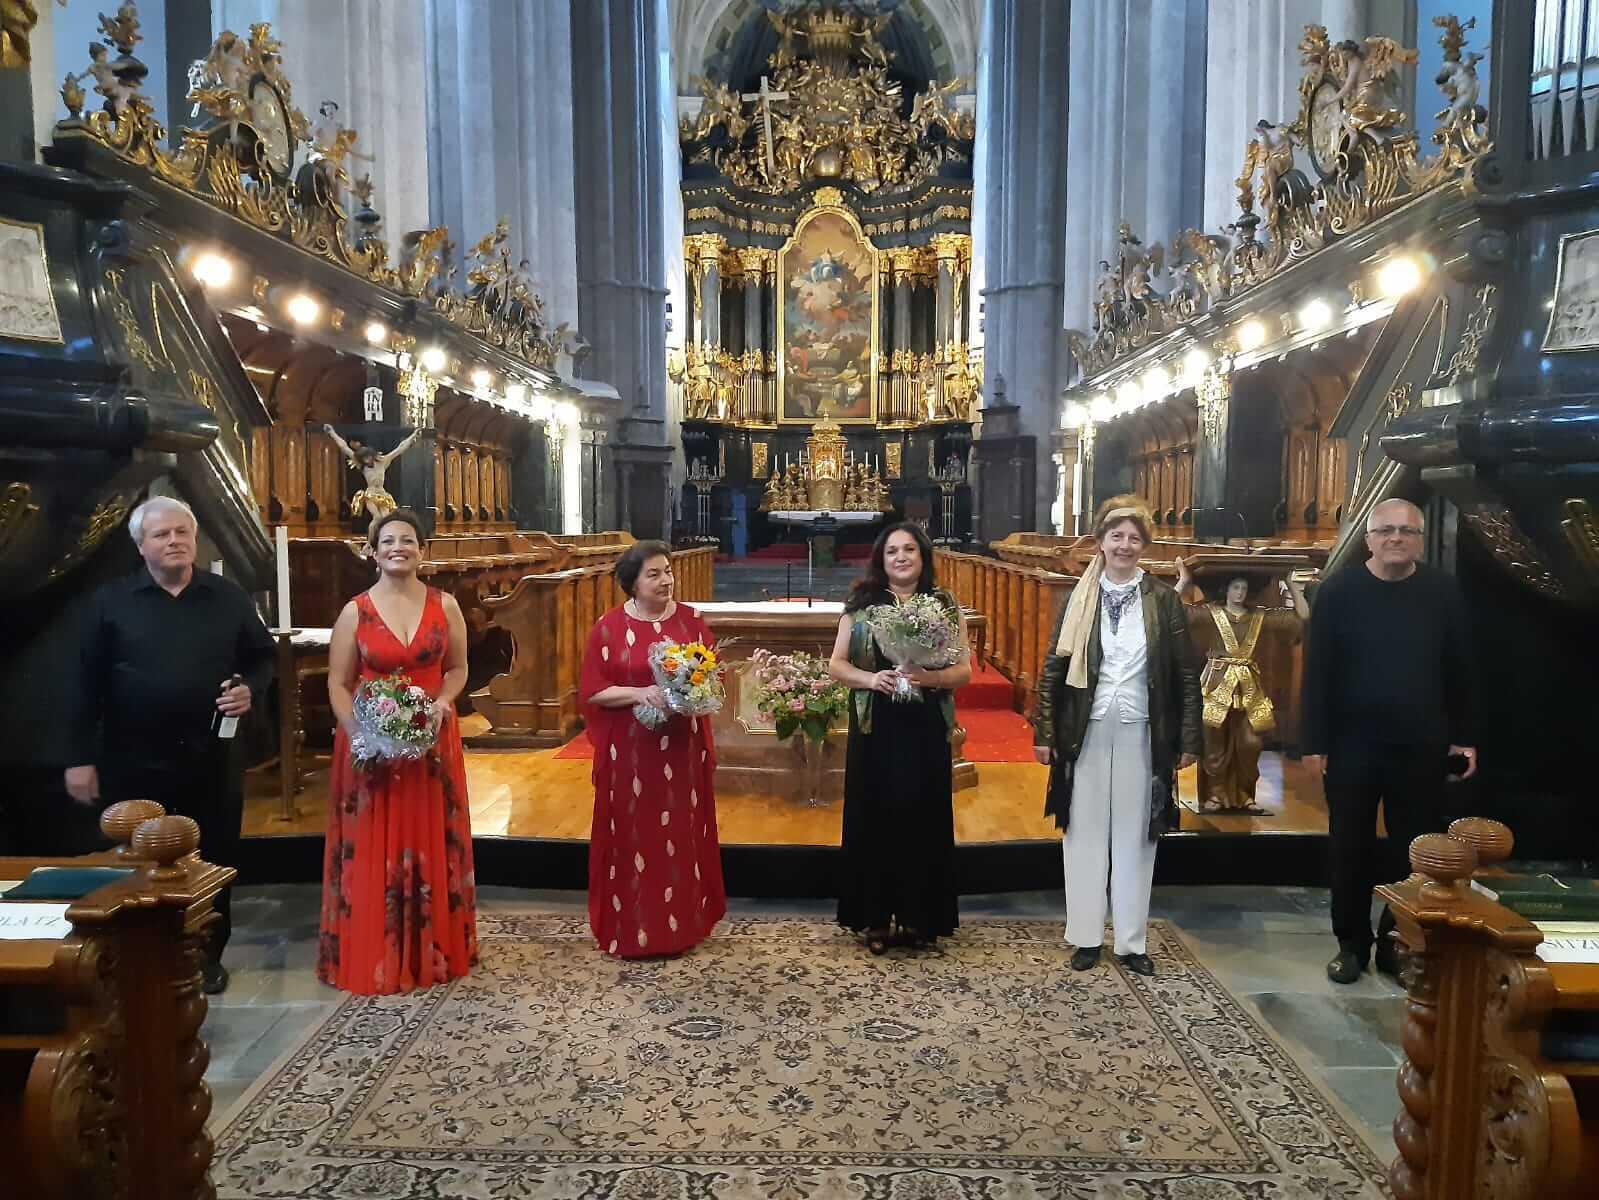 Dozenten spielten Volksliedbearbeitungen von Ludwig van Beethoven